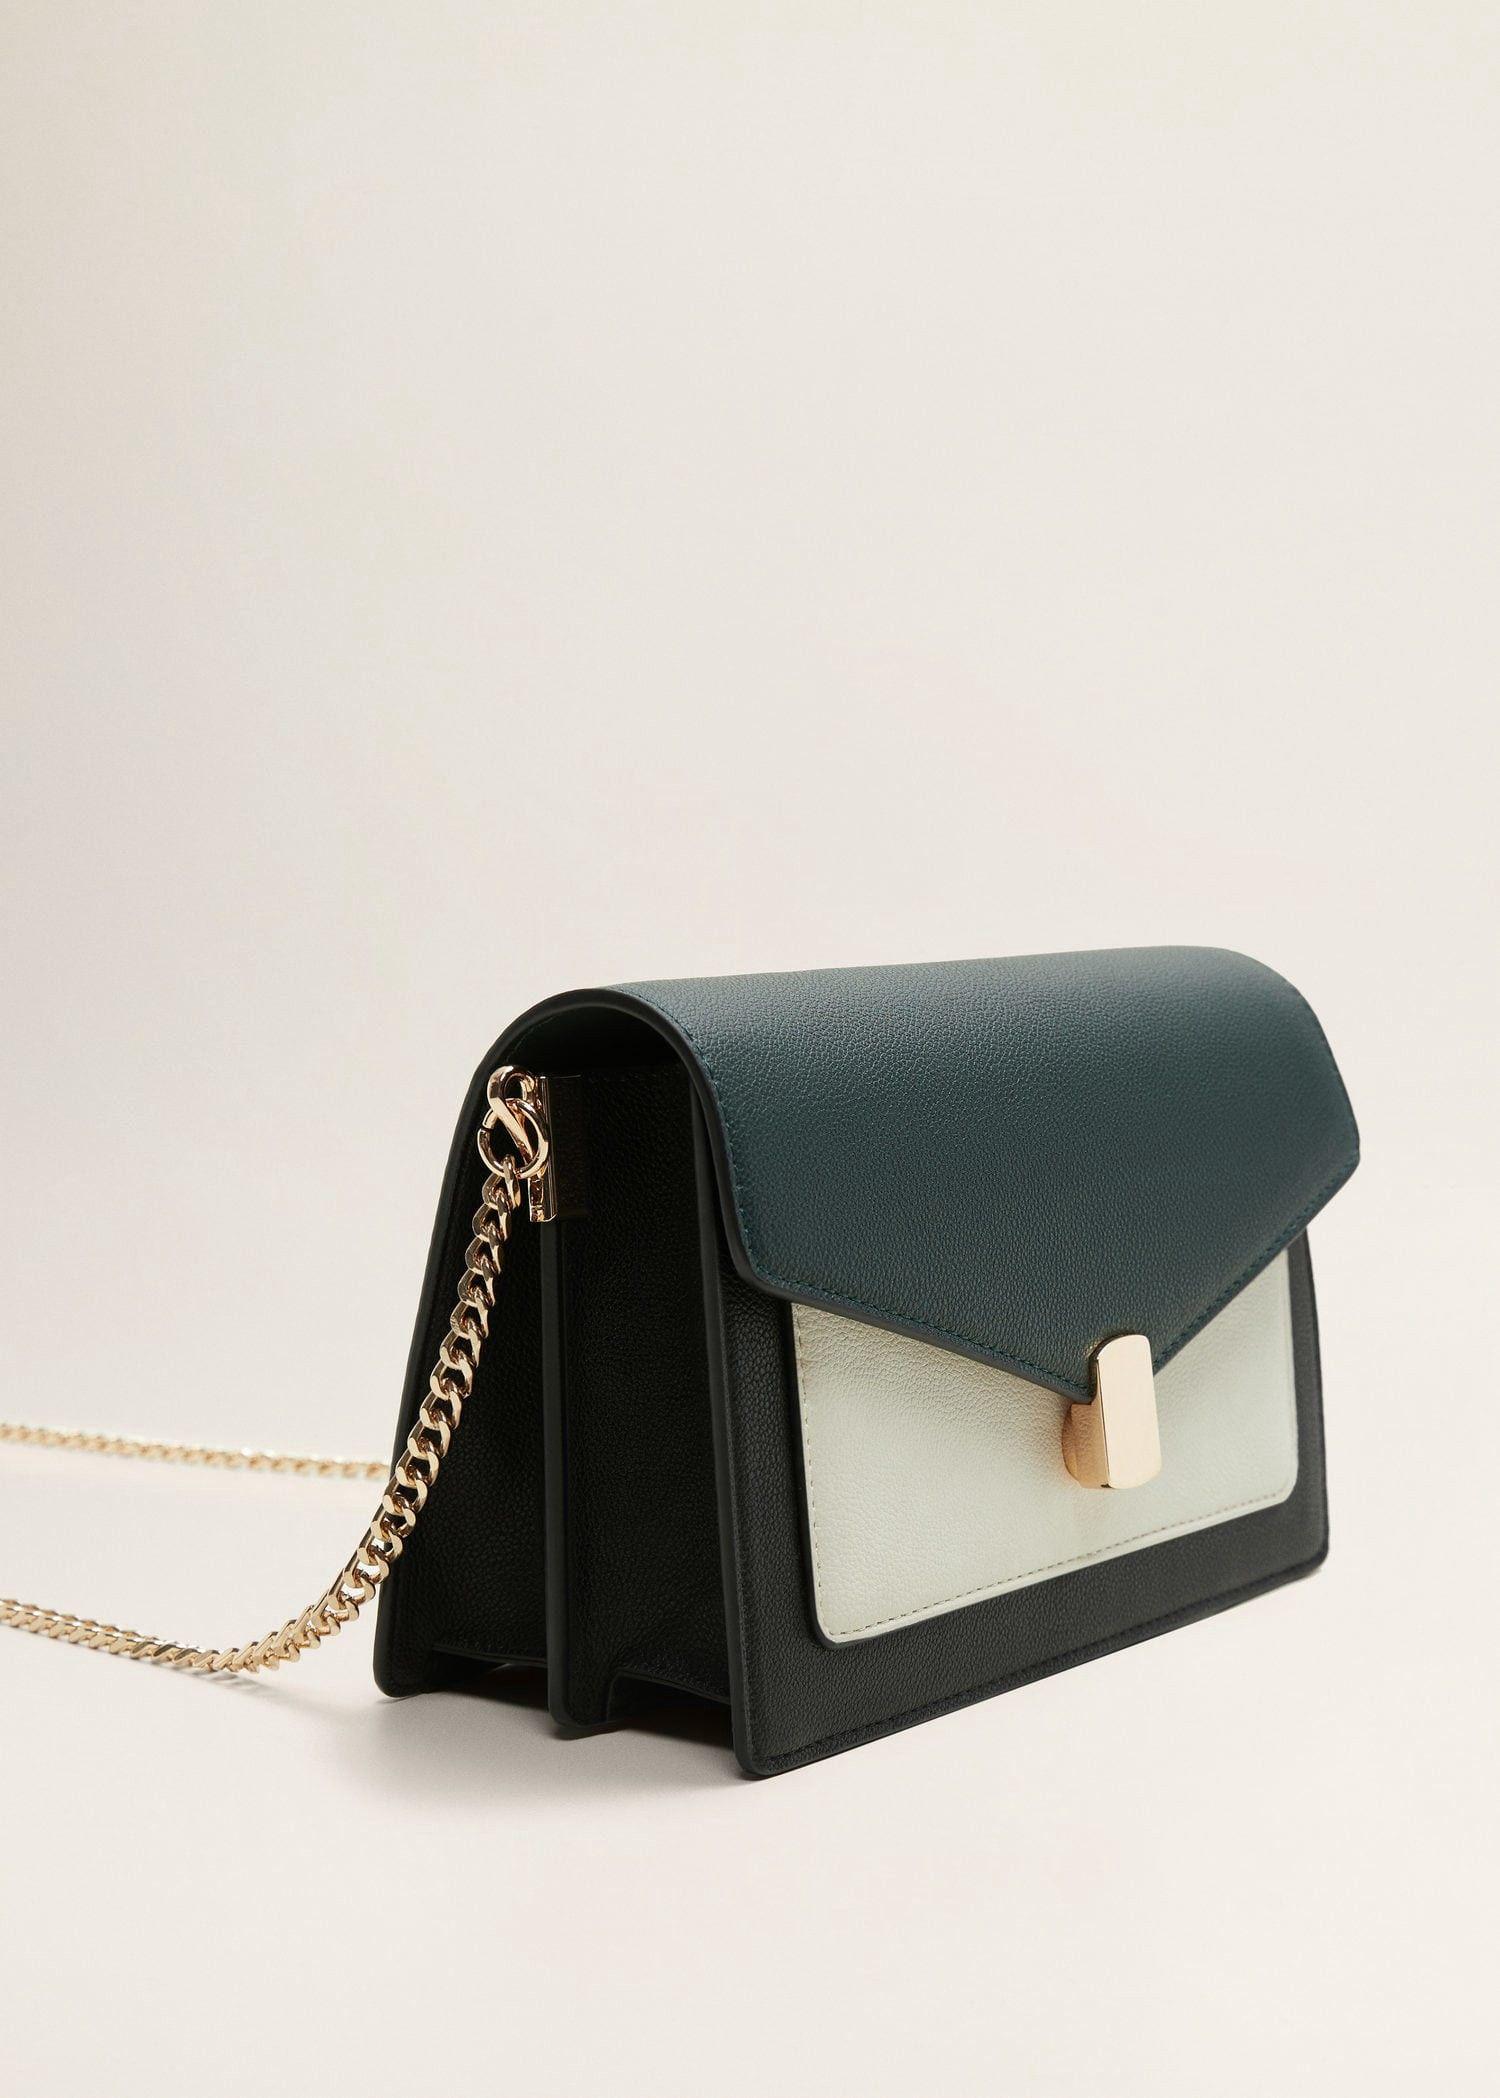 8befc2d265ae Mango Chain Cross Body Bag - Black One Size